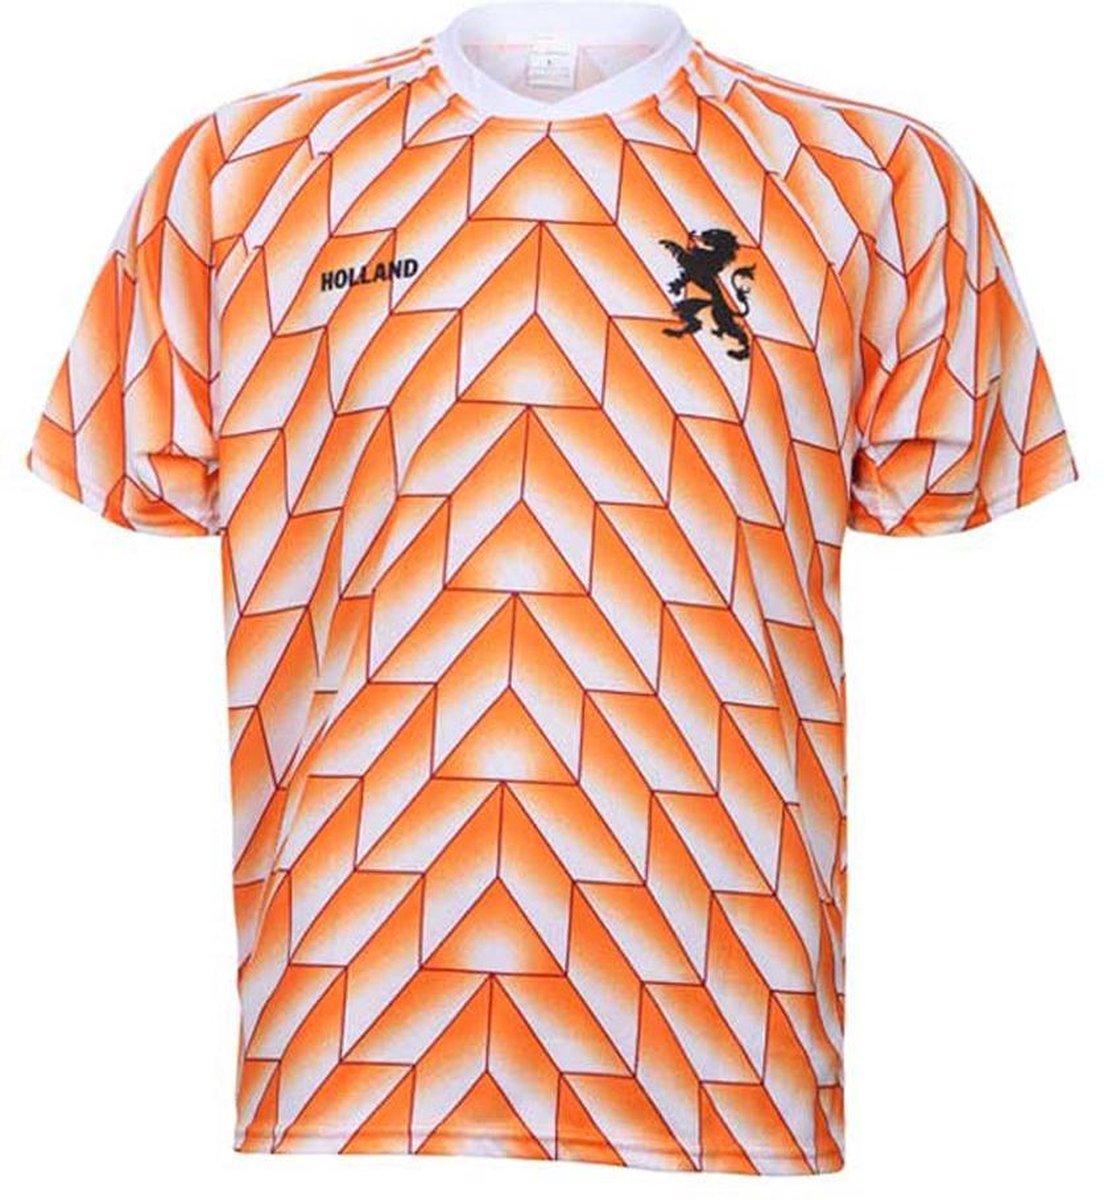 EK 88 Voetbalshirt 1988 Blanco-L